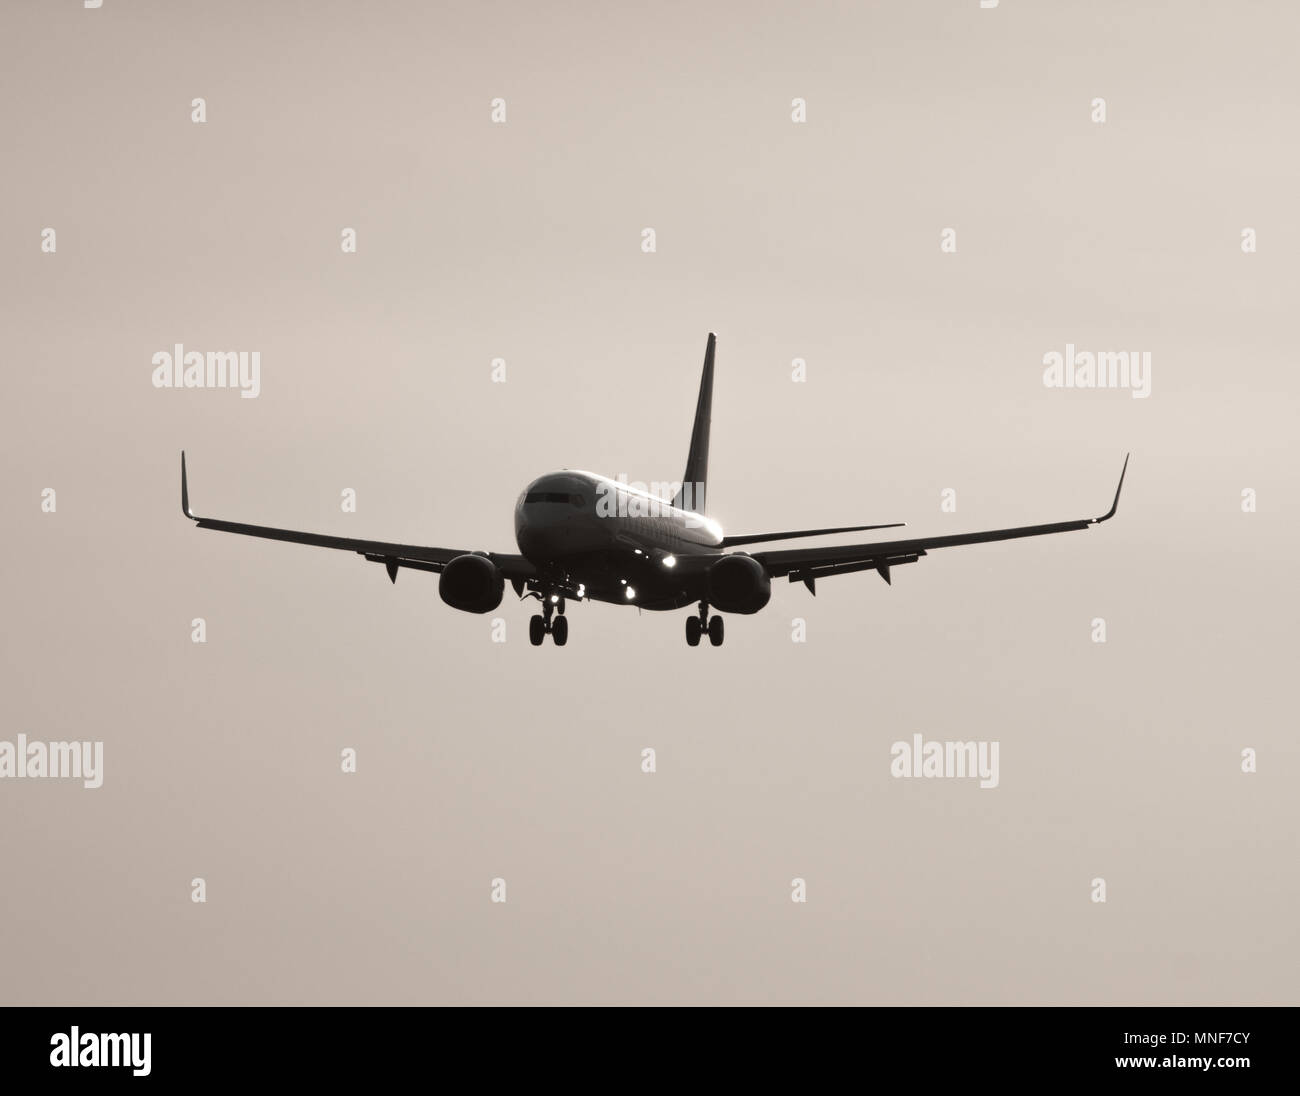 Jumbo jet high contrast landing - Stock Image